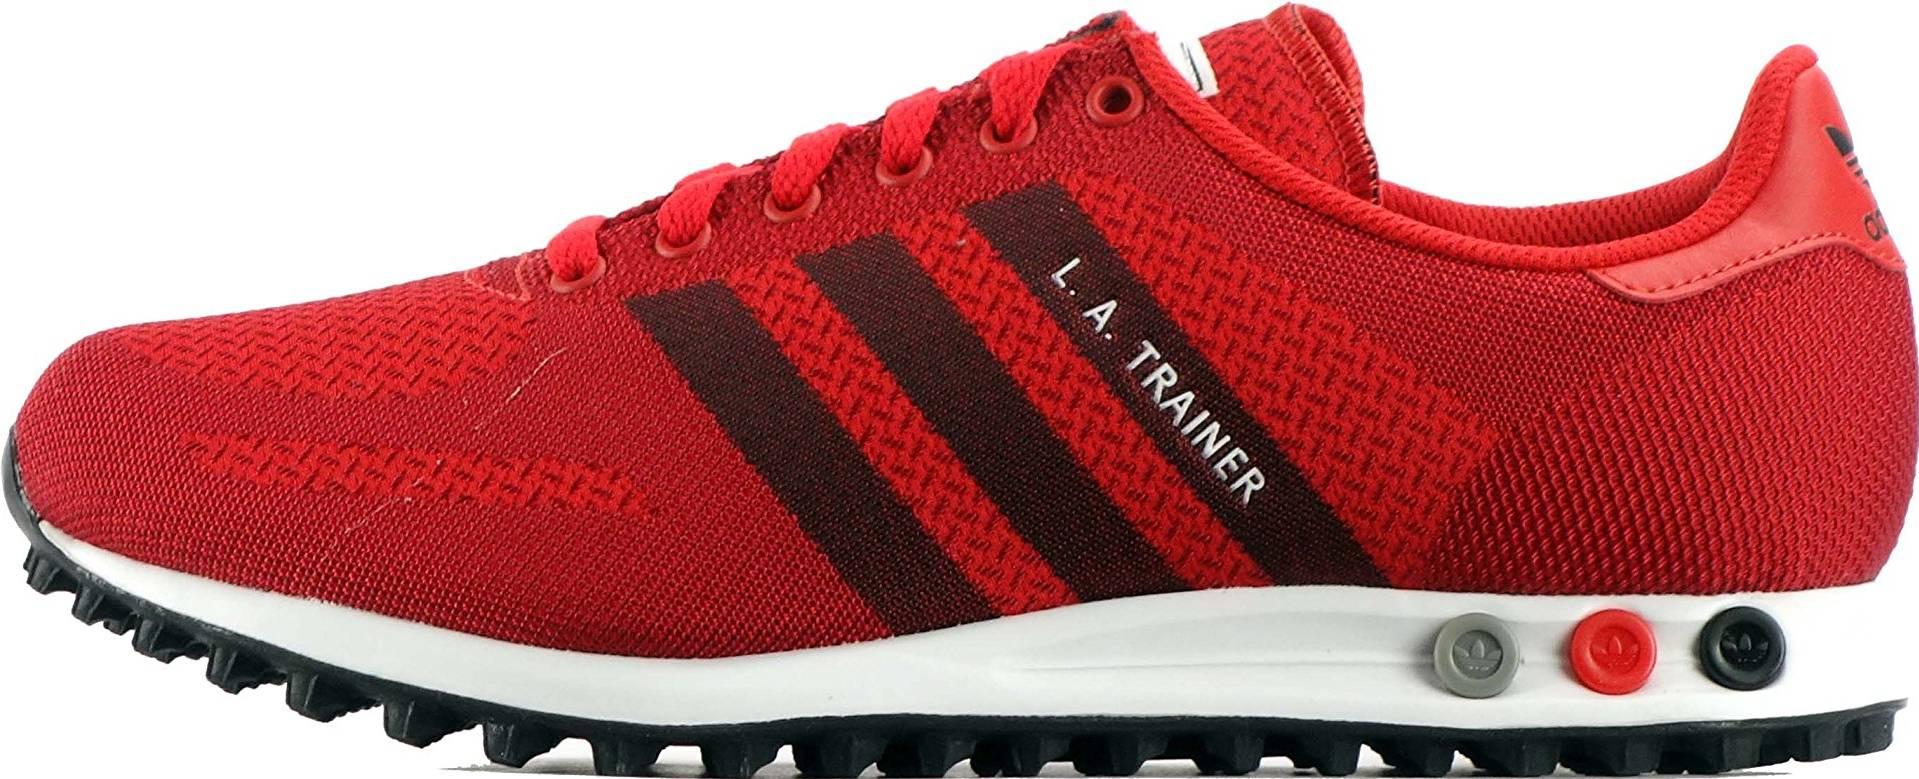 Popa Estéril Recitar  Only $70 + Review of Adidas LA Trainer Weave | RunRepeat